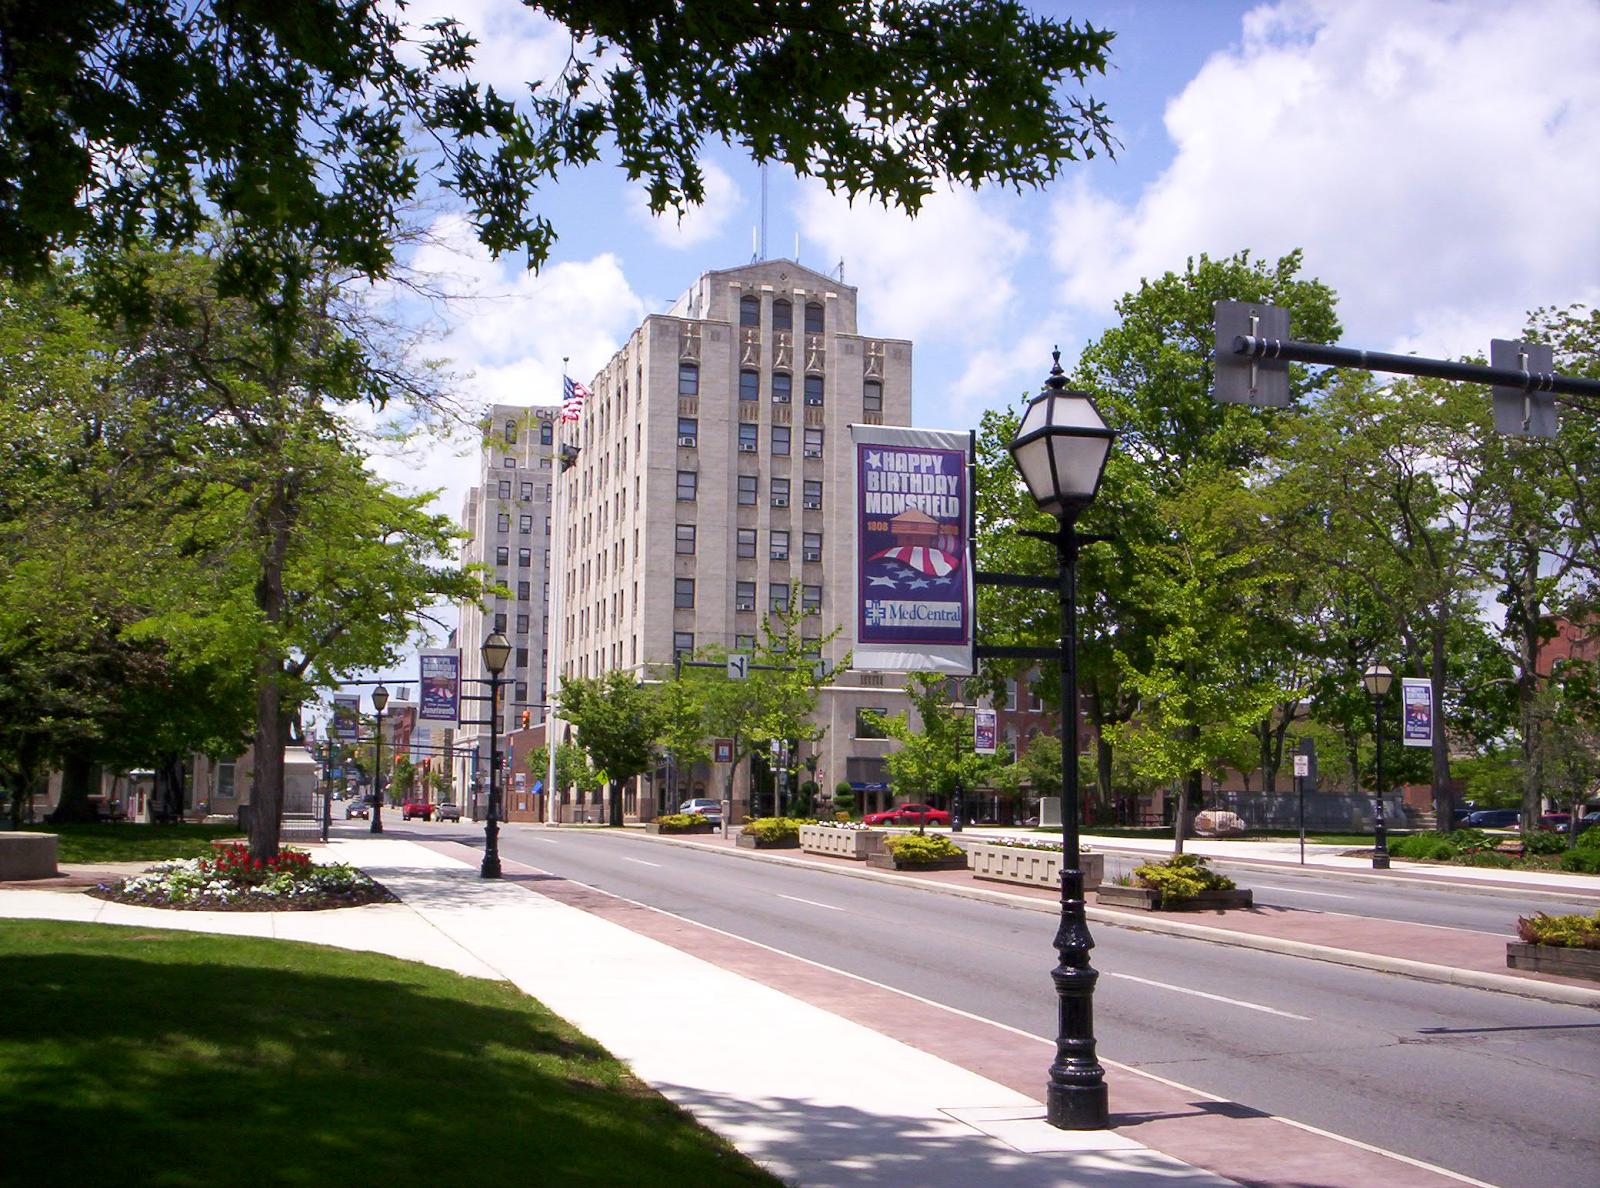 Historical downtown public square